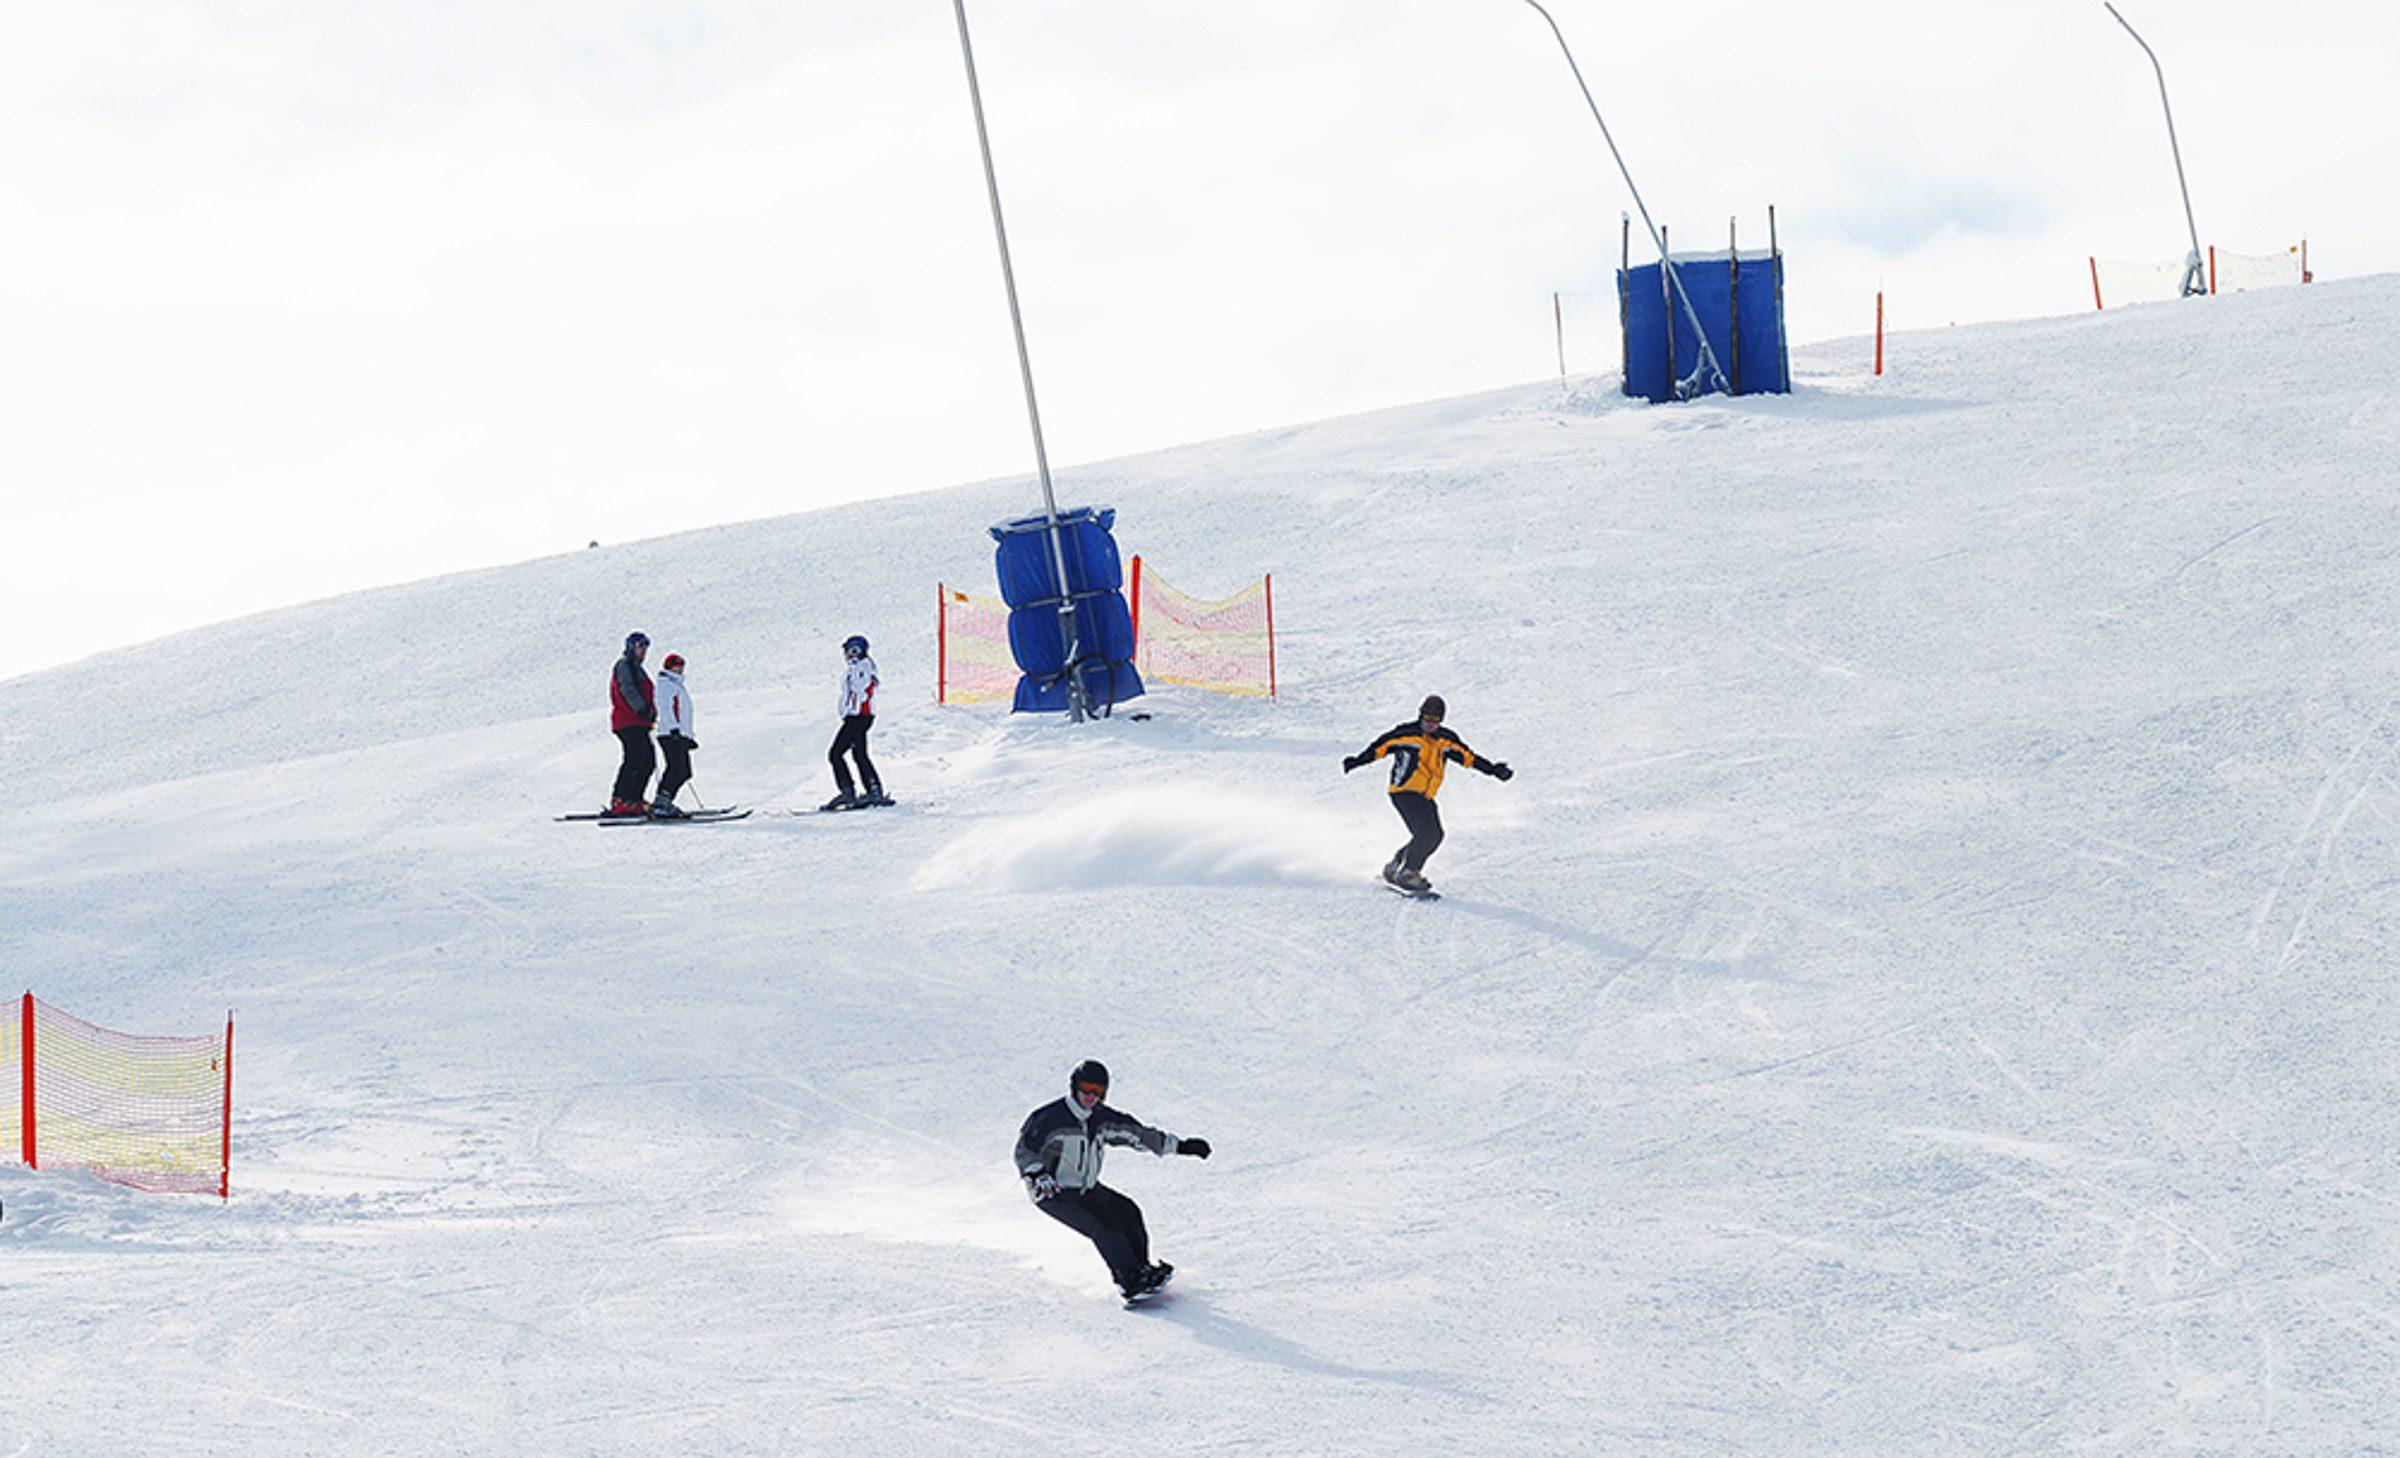 Stok narciarski. Fot. Anna Lewiak